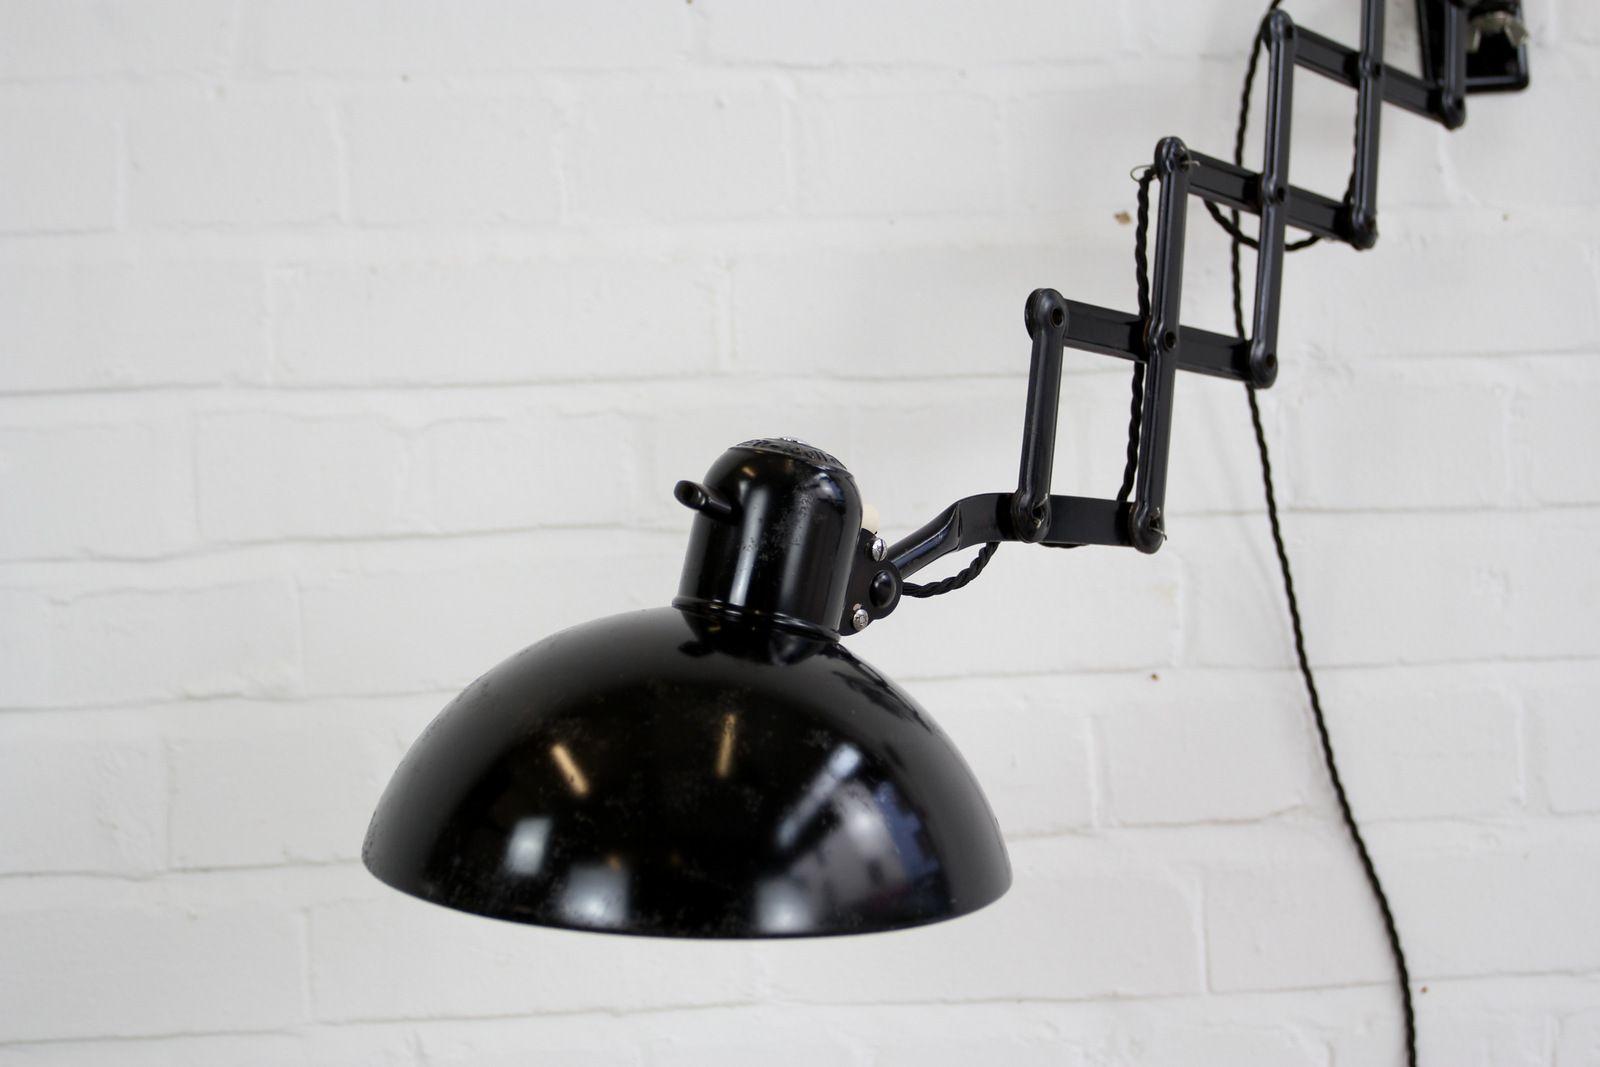 industrielle modell 6718 scherenlampe von christian dell. Black Bedroom Furniture Sets. Home Design Ideas